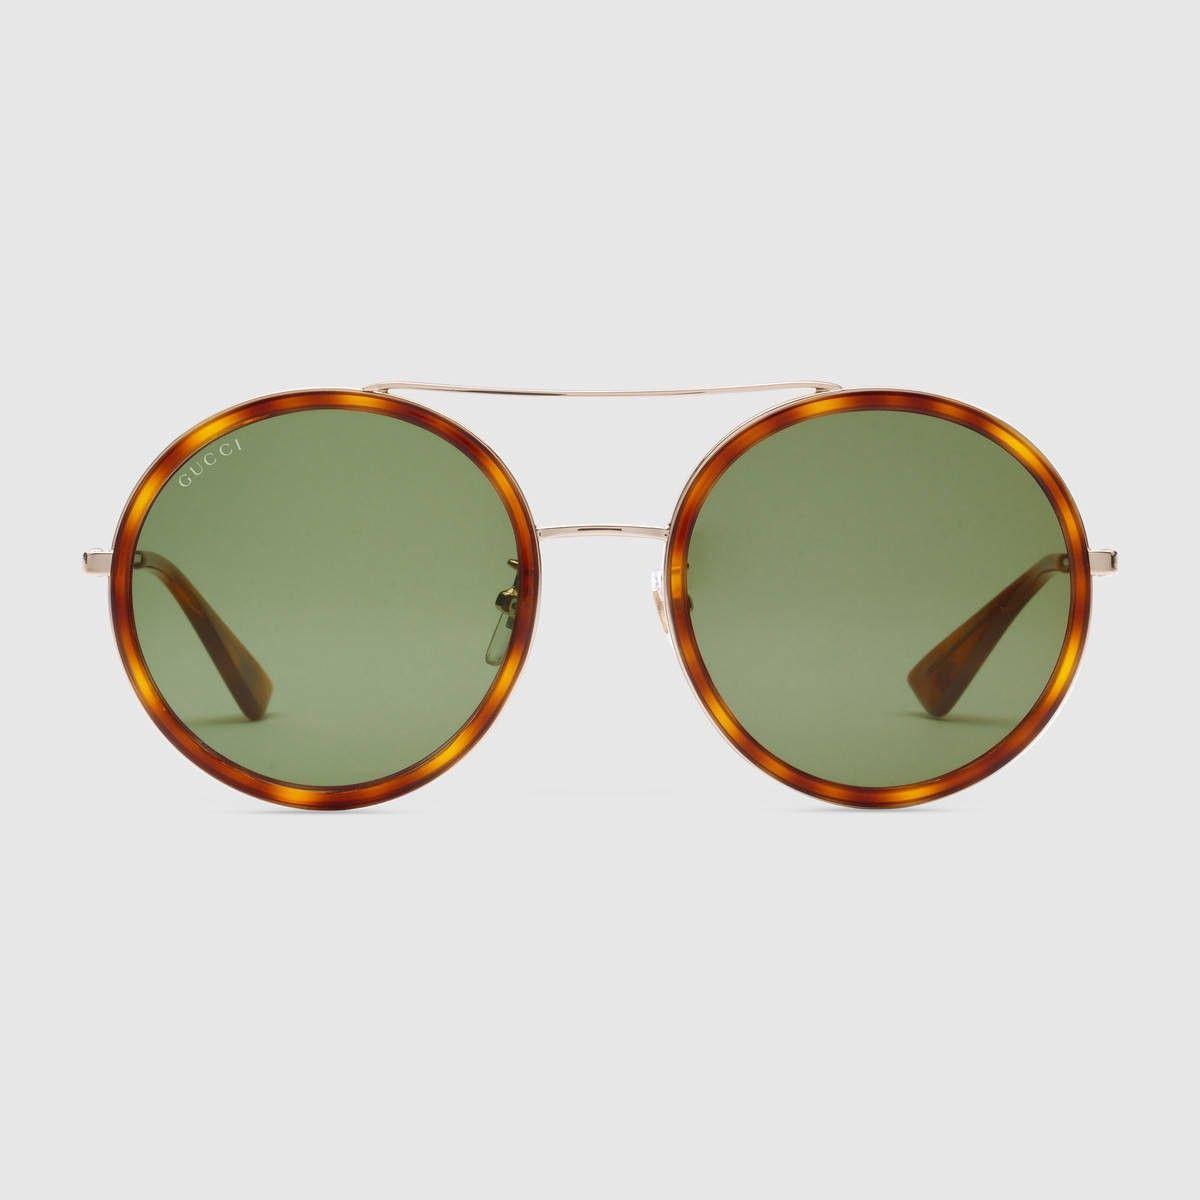 Lunettes De Femmes · GUCCI Round-Frame Sunglasses - Gold Metal Light  Tortoiseshell.  gucci  all 701822947afd